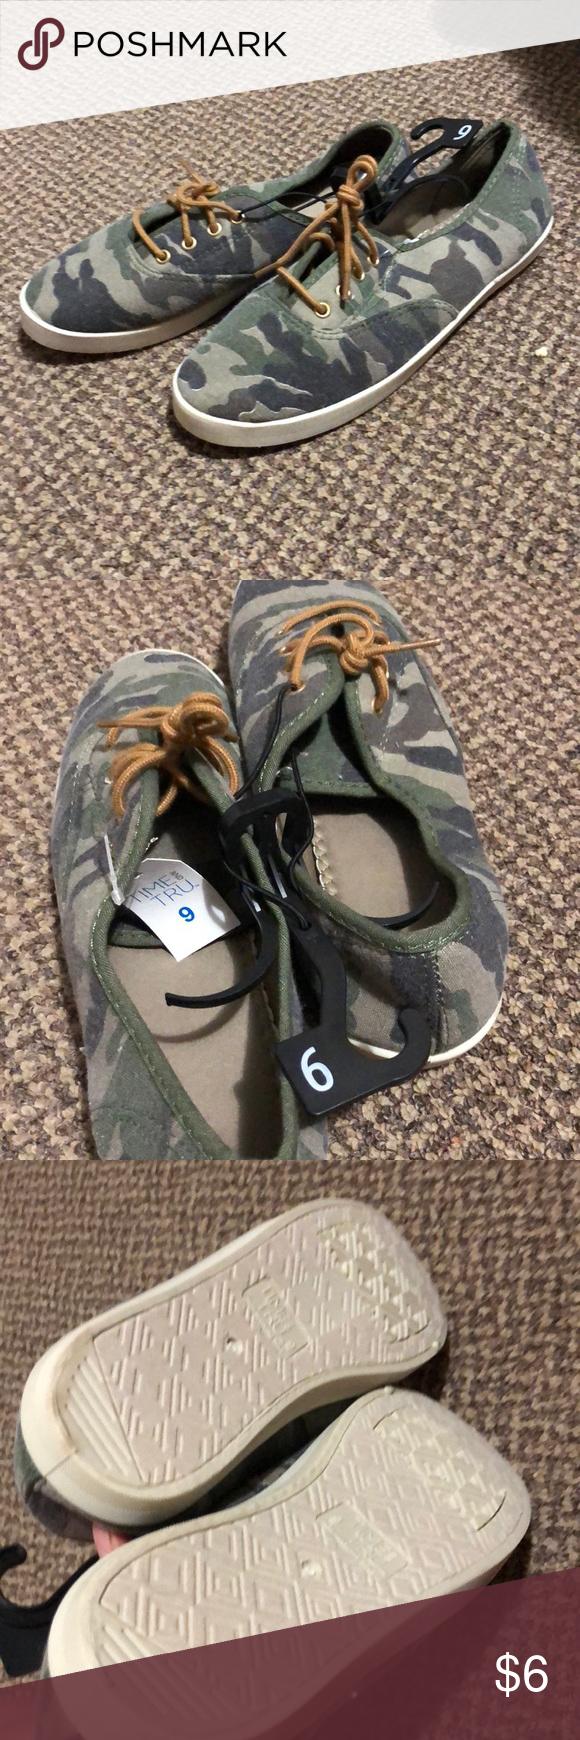 Shoes Flats \u0026 Loafers | My Posh Closet